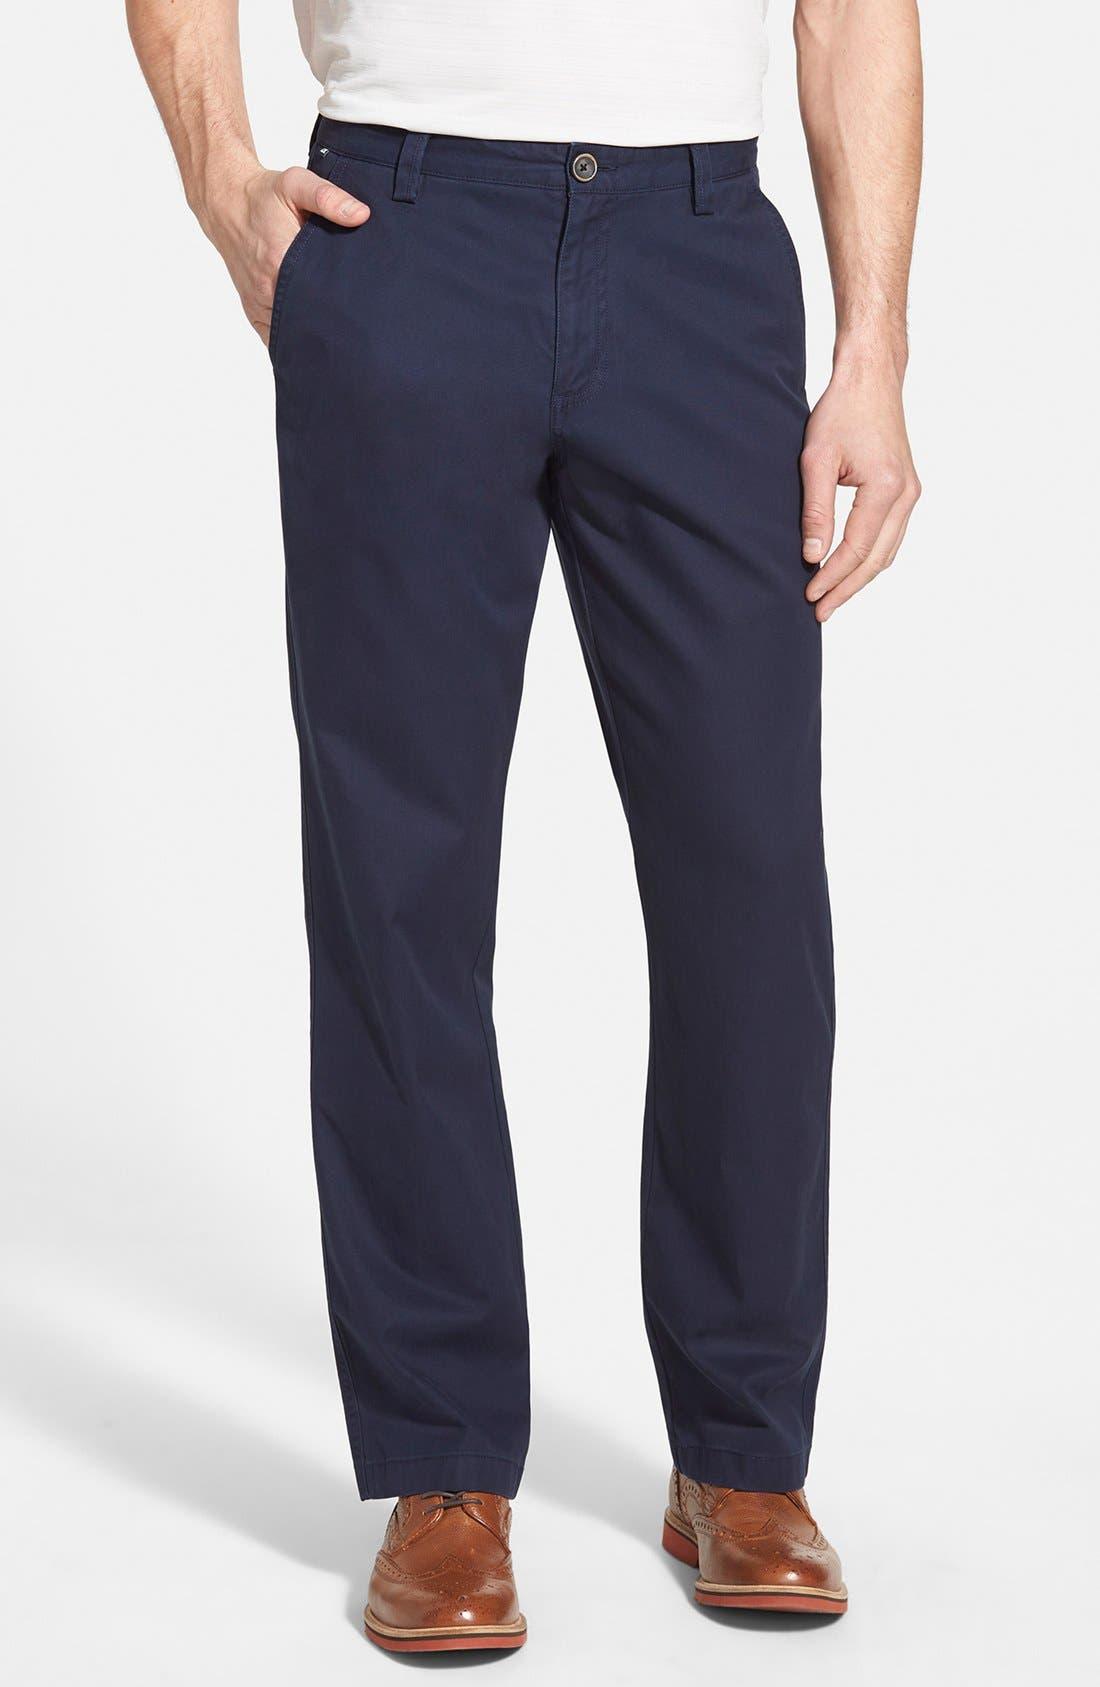 Beckett Straight Leg Washed Cotton Pants,                         Main,                         color, LIBERTY NAVY